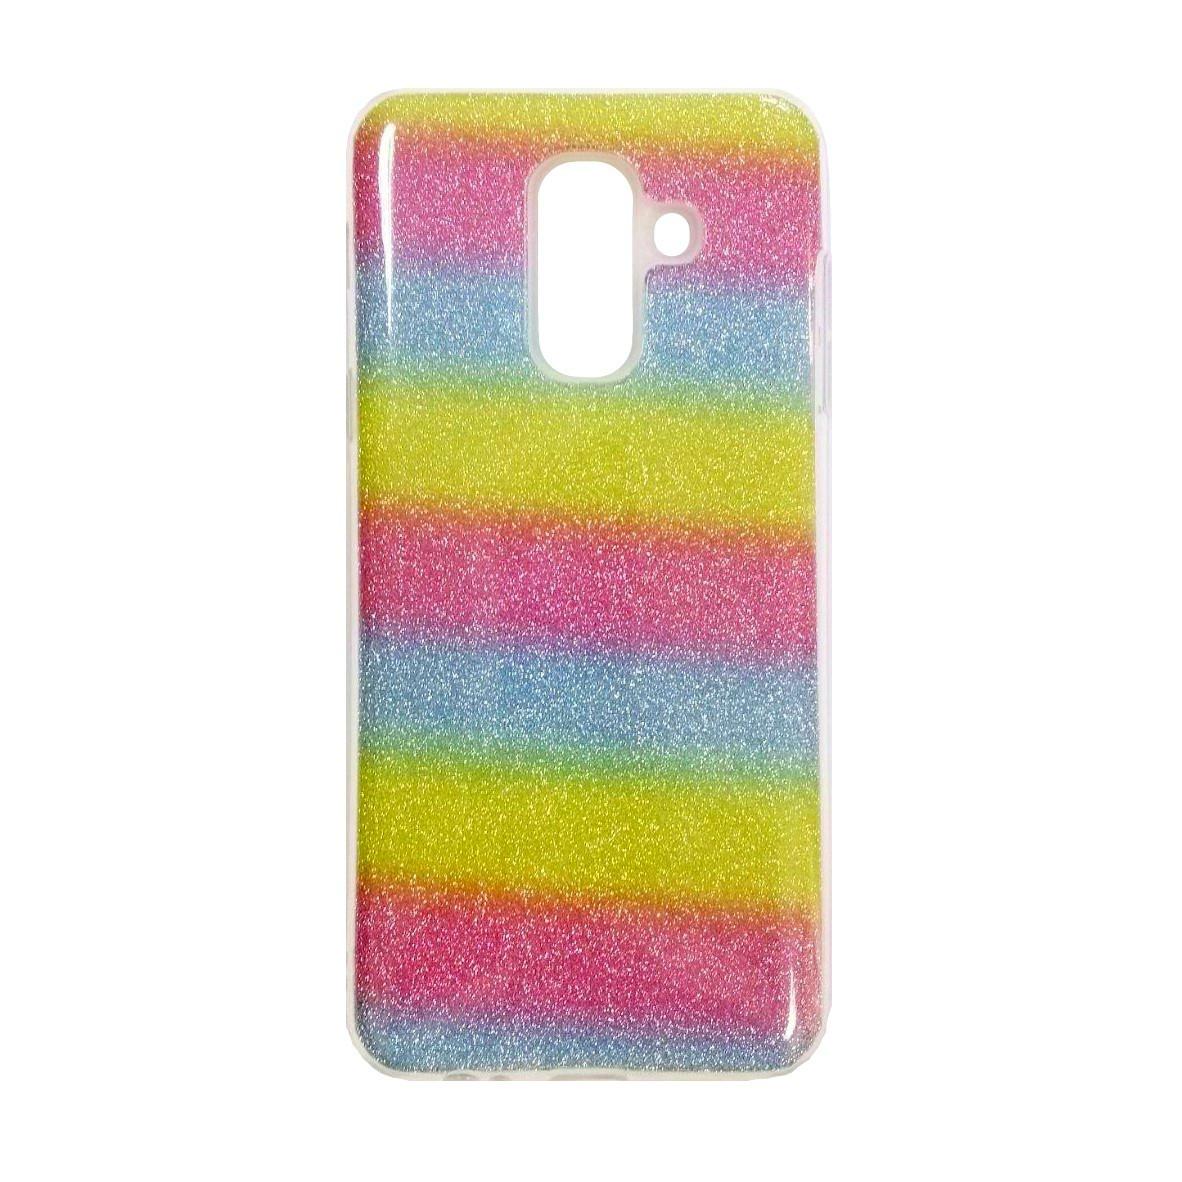 Силикон Twins Samsung Galaxy A6 Plus (2018) A605 (Радуга)